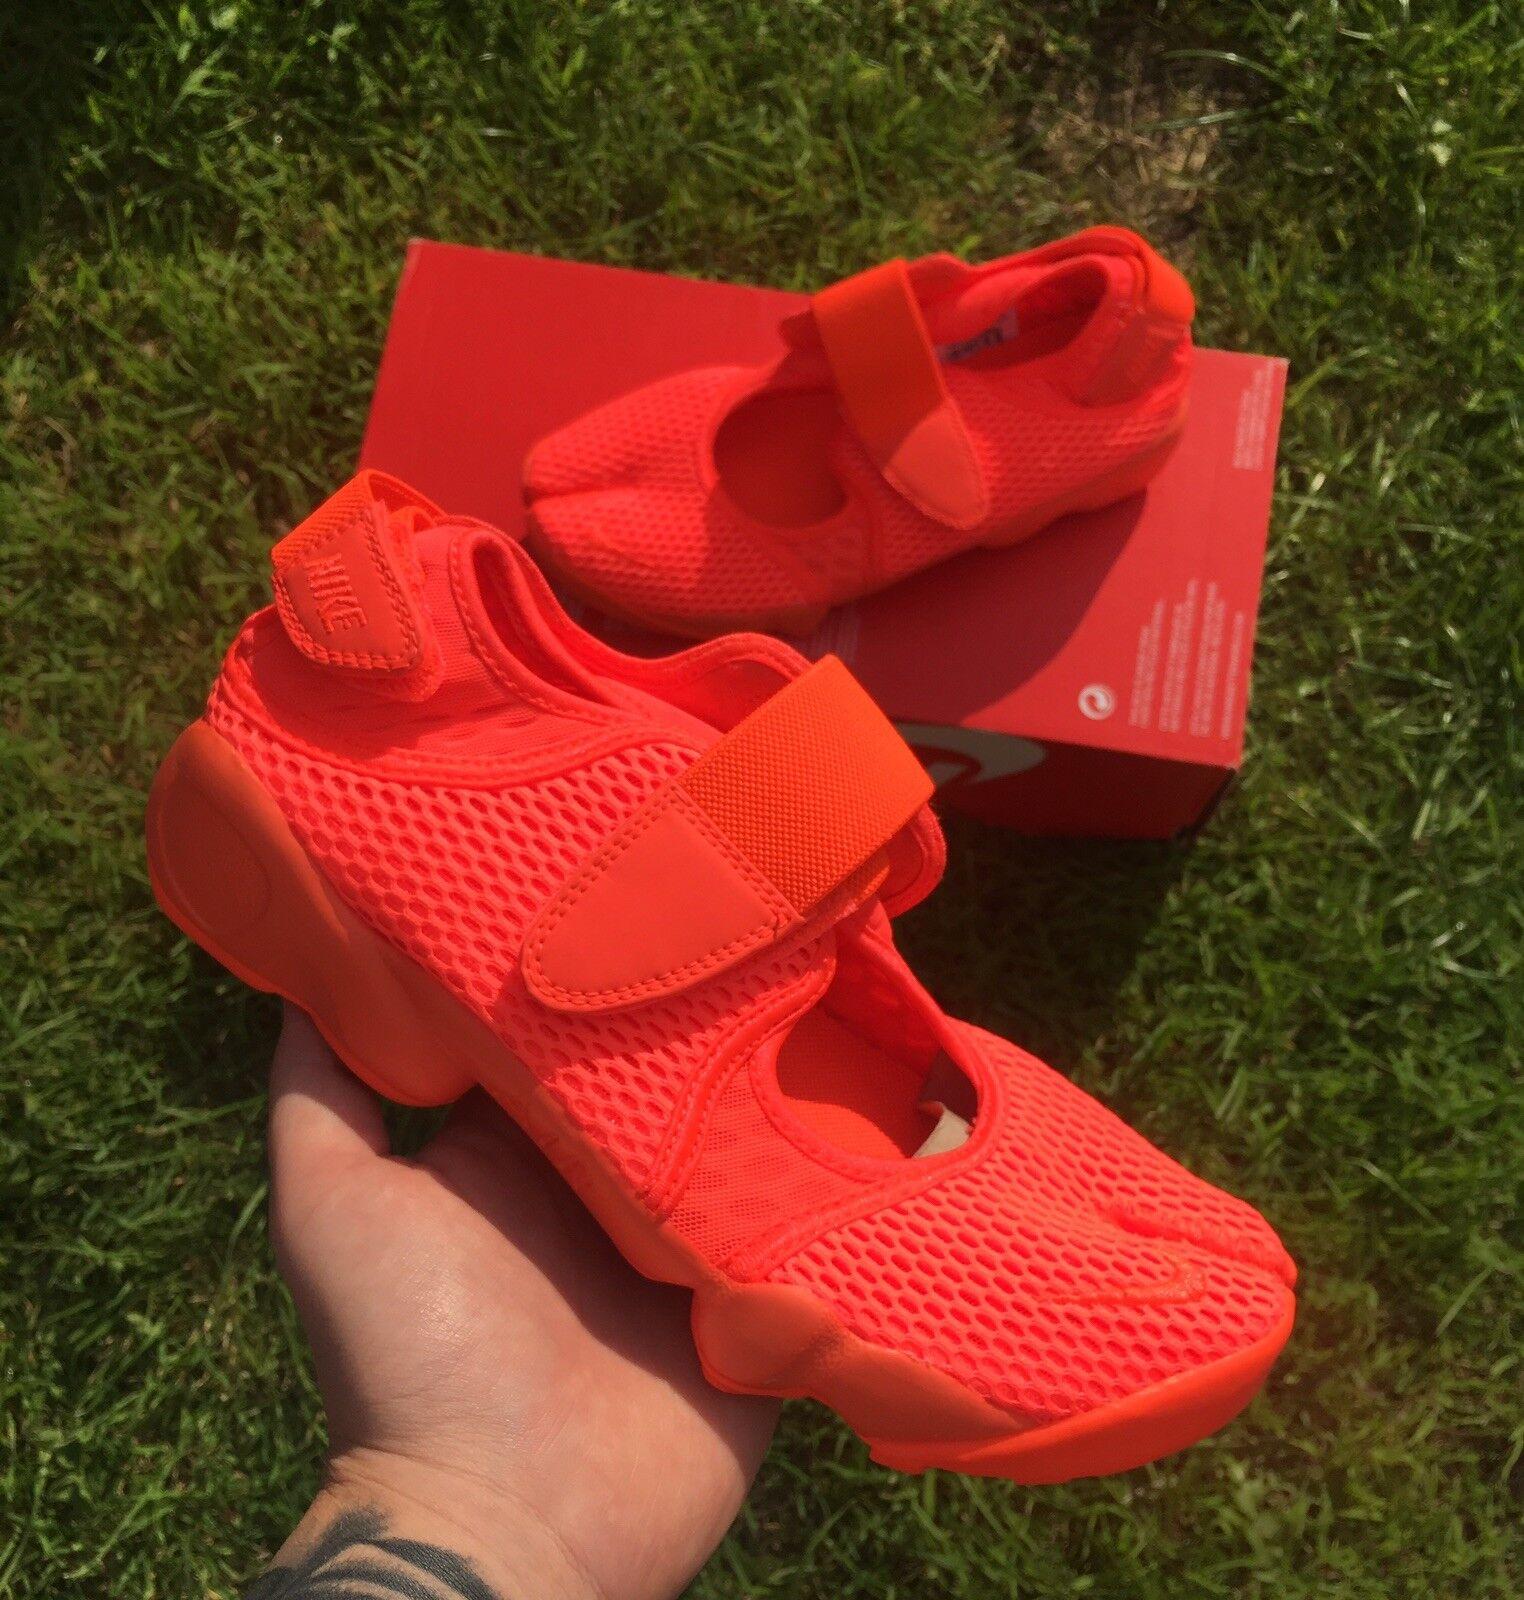 Nike Air Rift Rift Rift BR Trainers Size 8cbe62